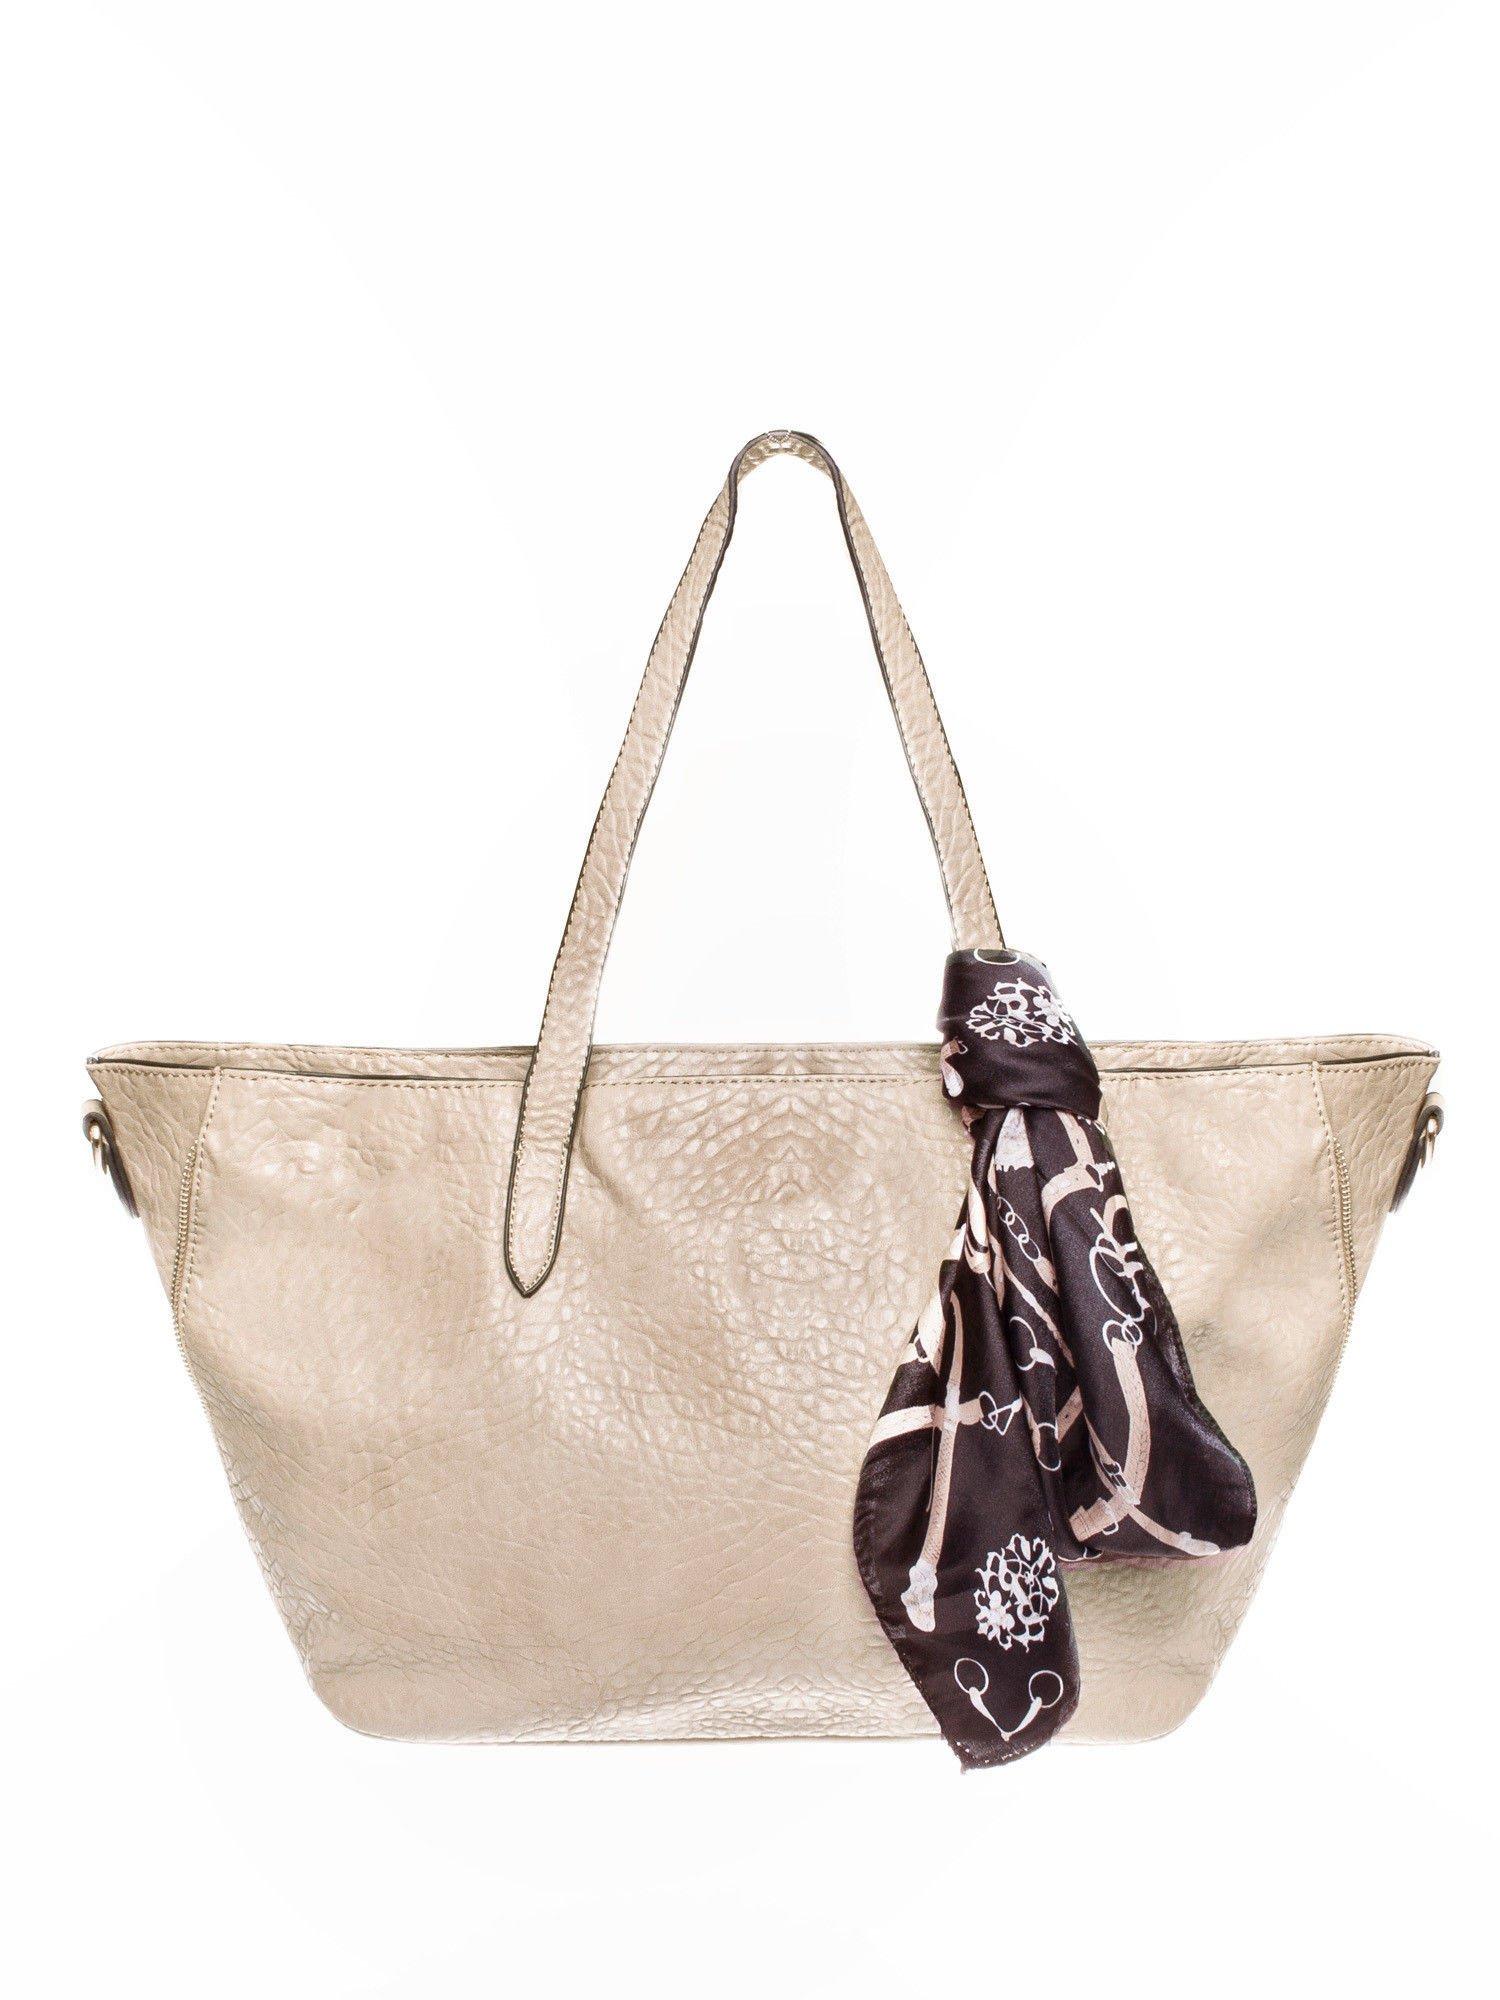 Beżowa torebka shopper bag z apaszką                                  zdj.                                  1